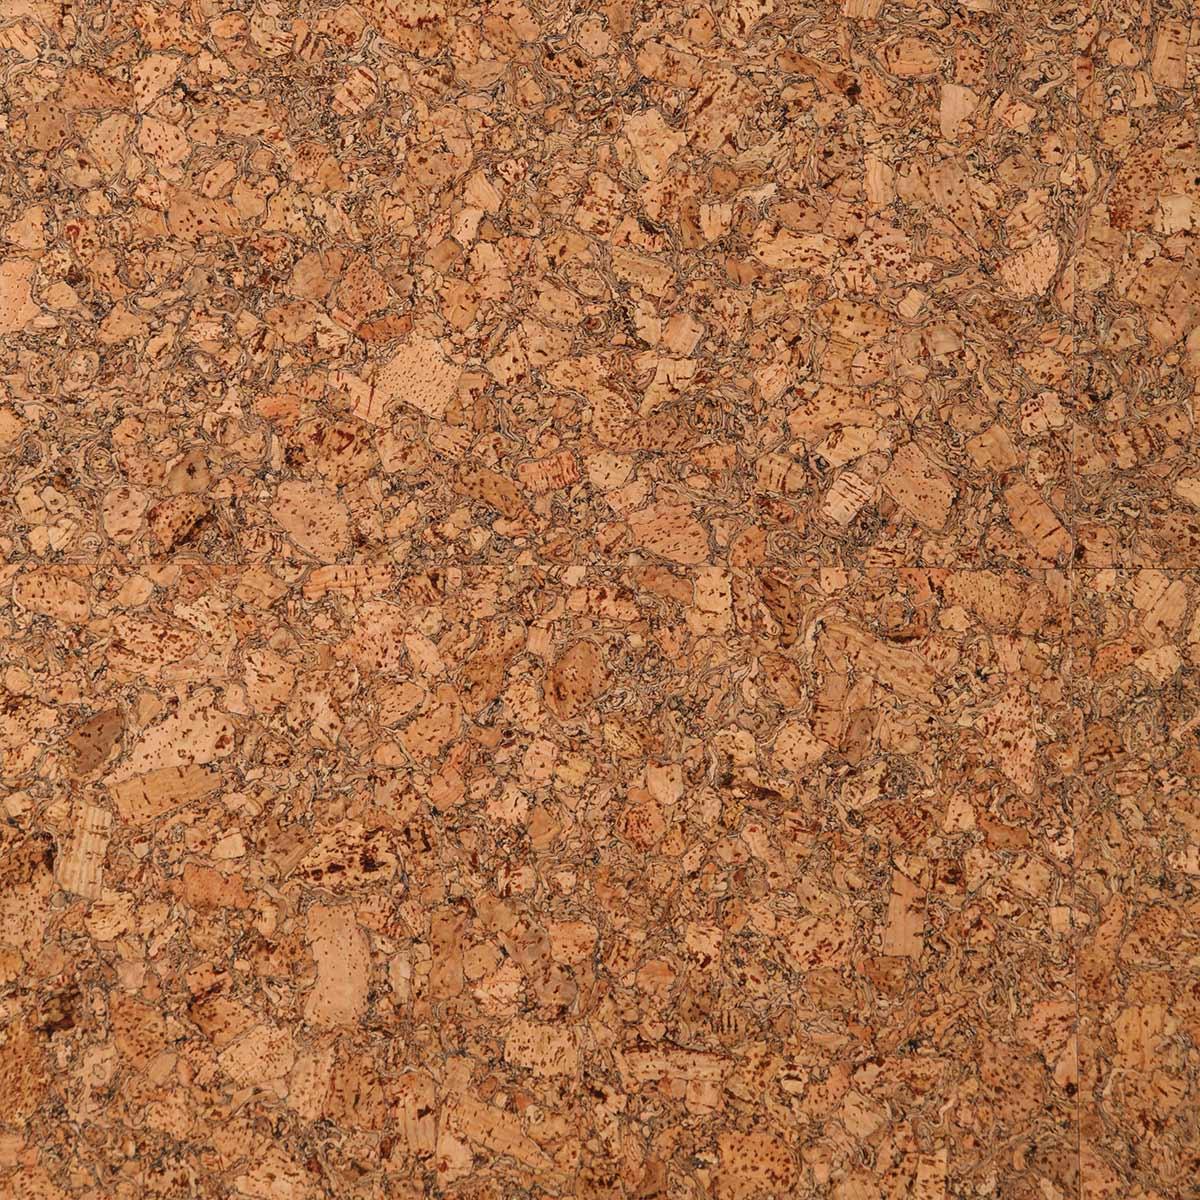 Tesoro woods cork flooring 11 5 8 vino castelo for Engineered cork flooring